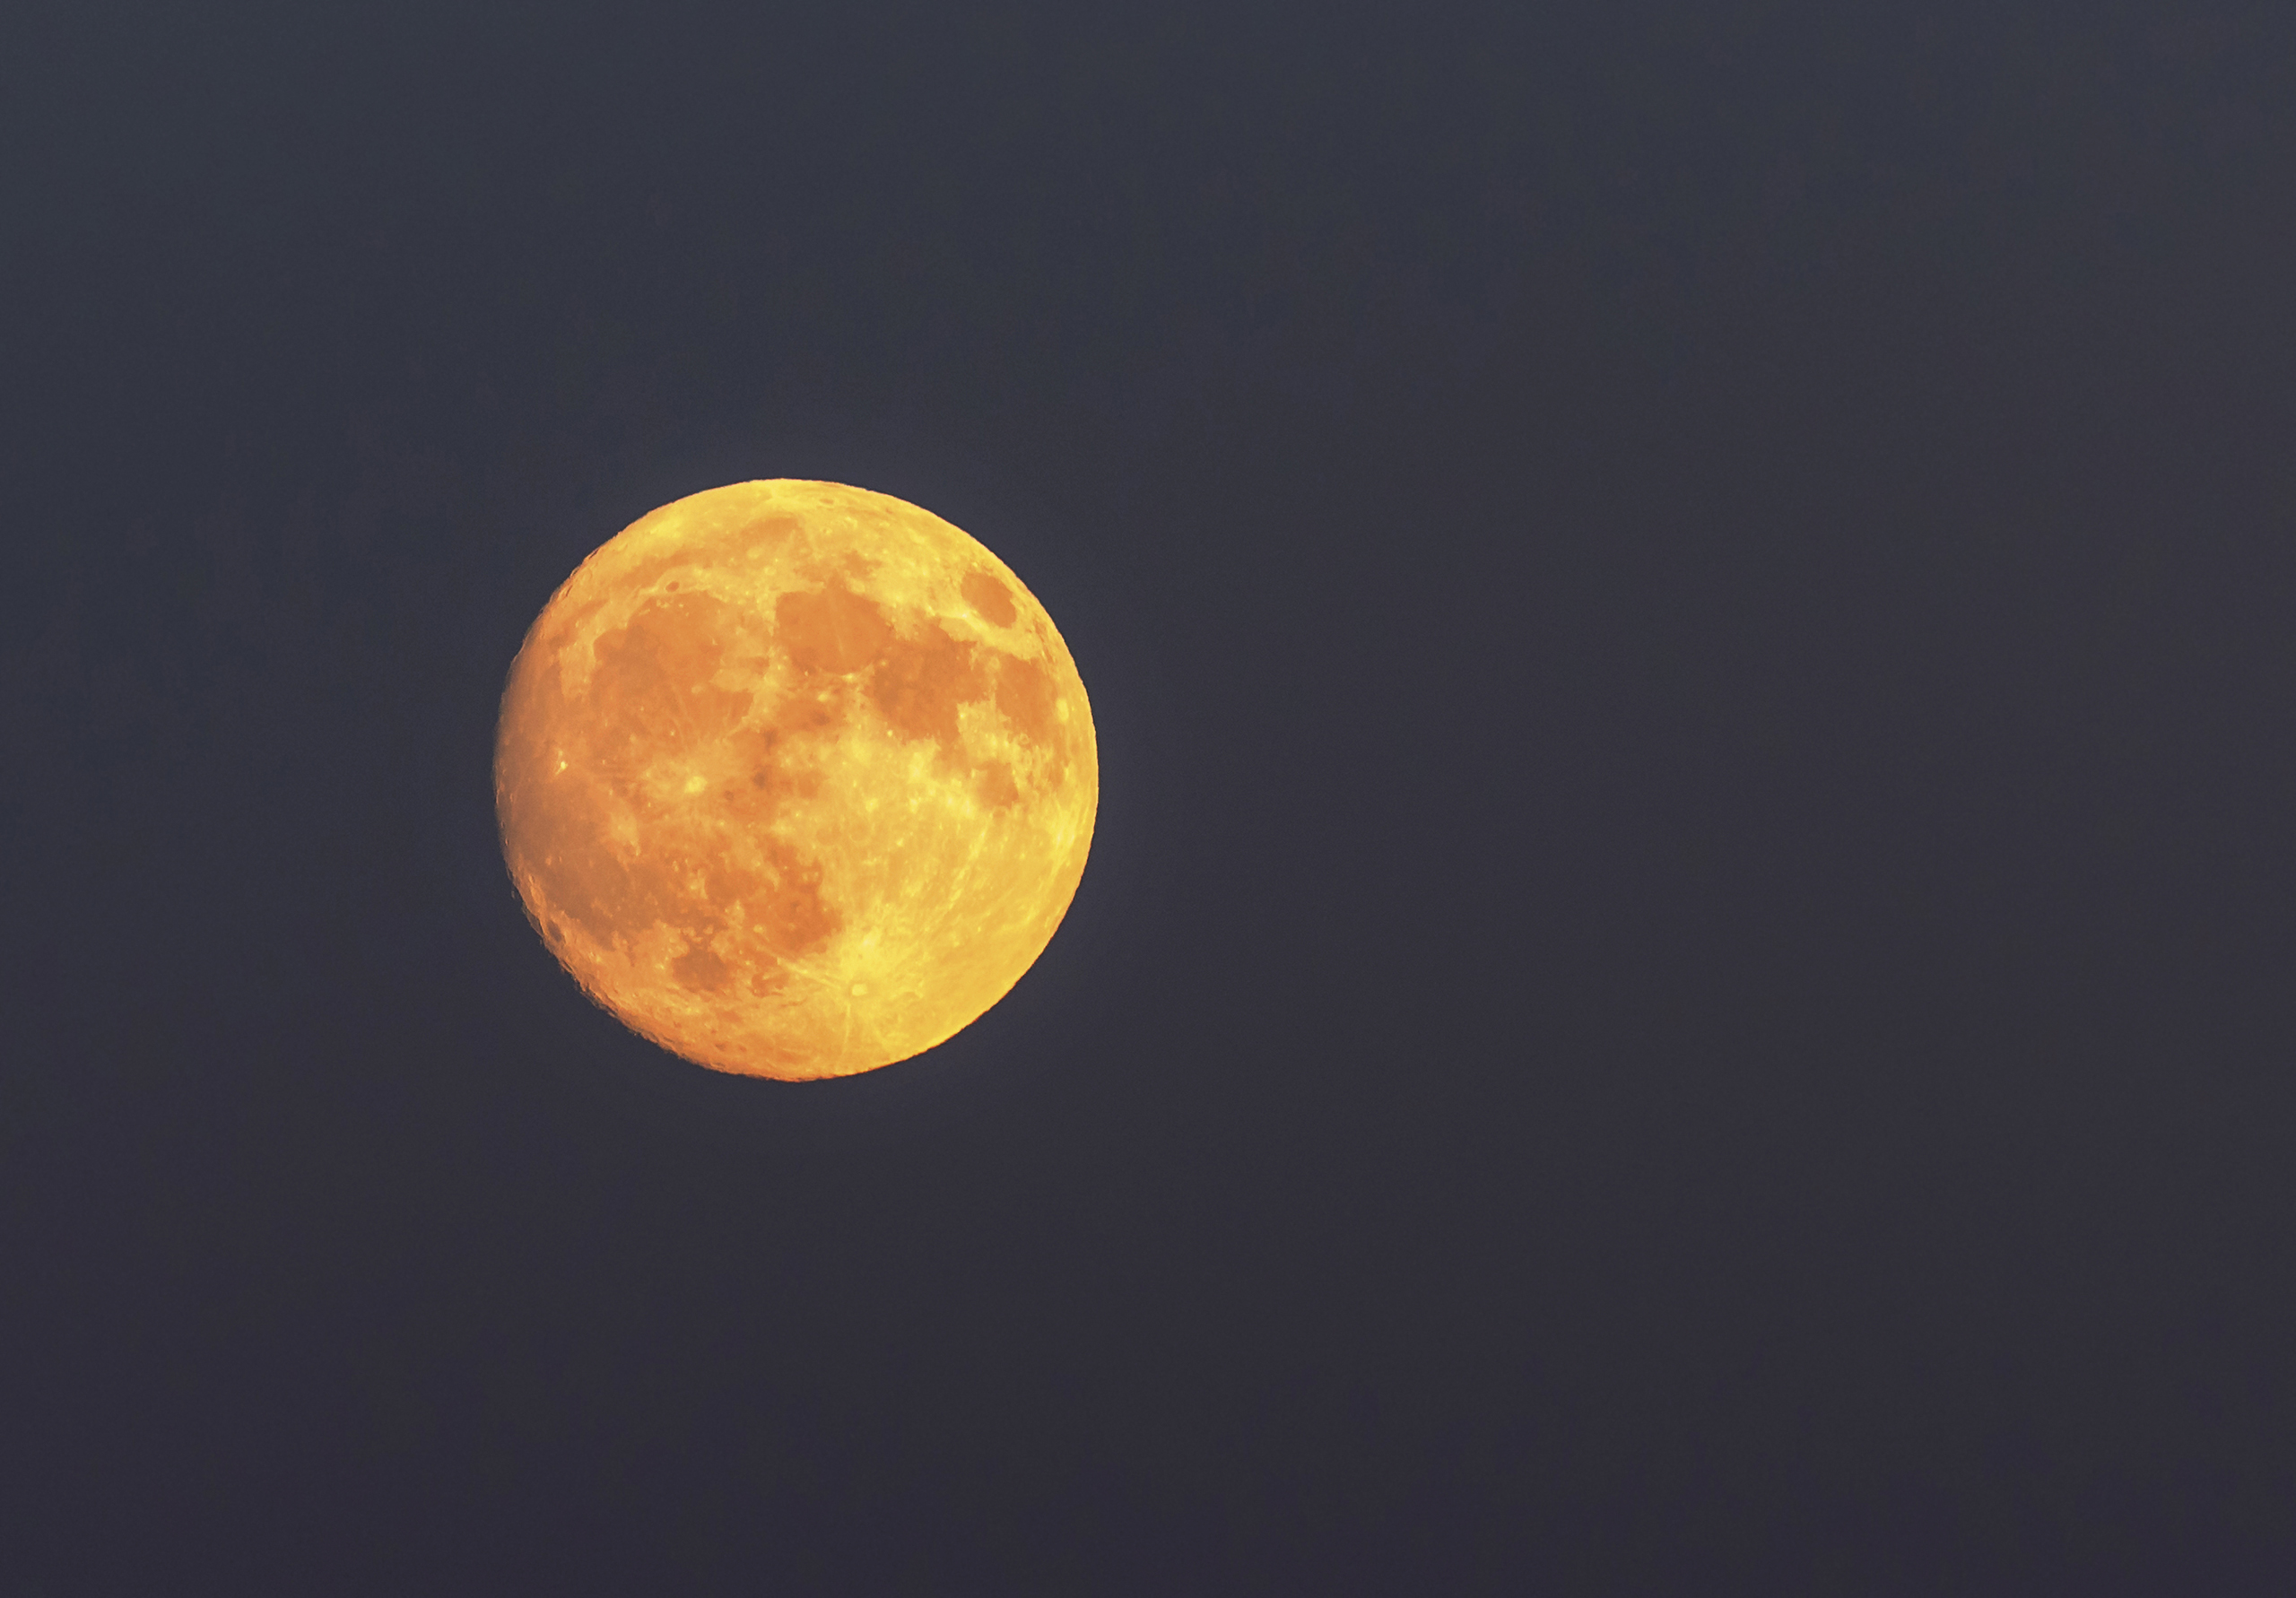 Full moon seen in Toronto, Canada on Oct. 14, 2016.